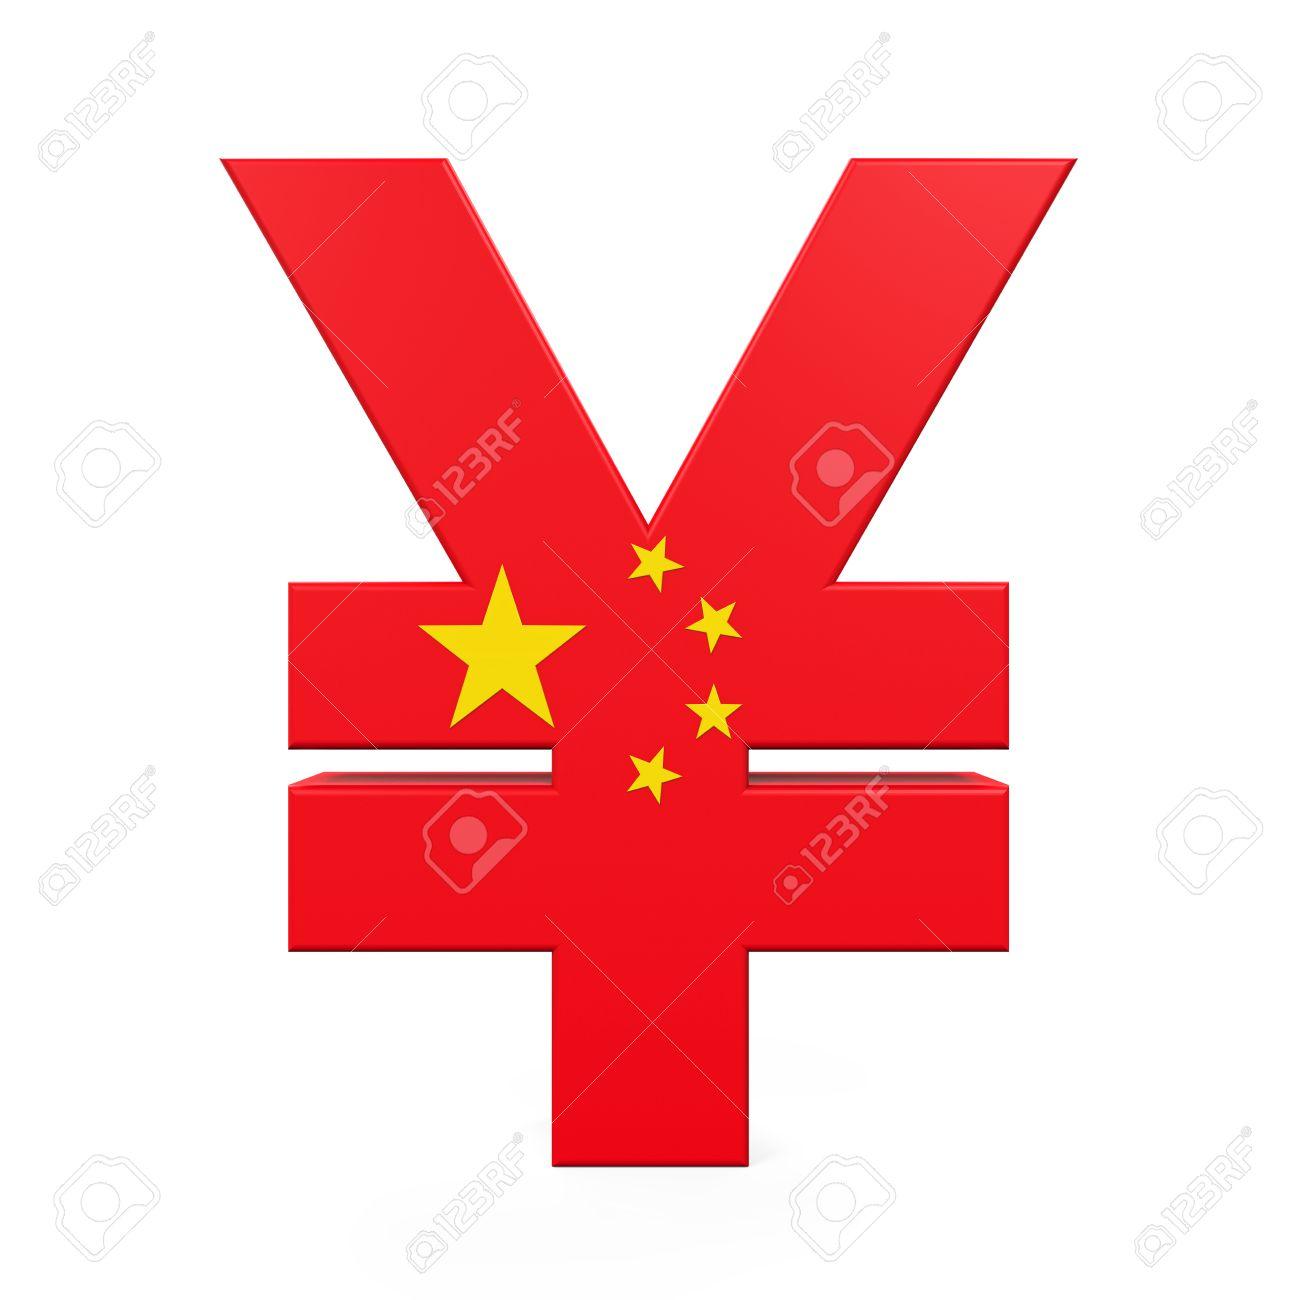 Chinese yuan symbol stock photo picture and royalty free image chinese yuan symbol buycottarizona Gallery